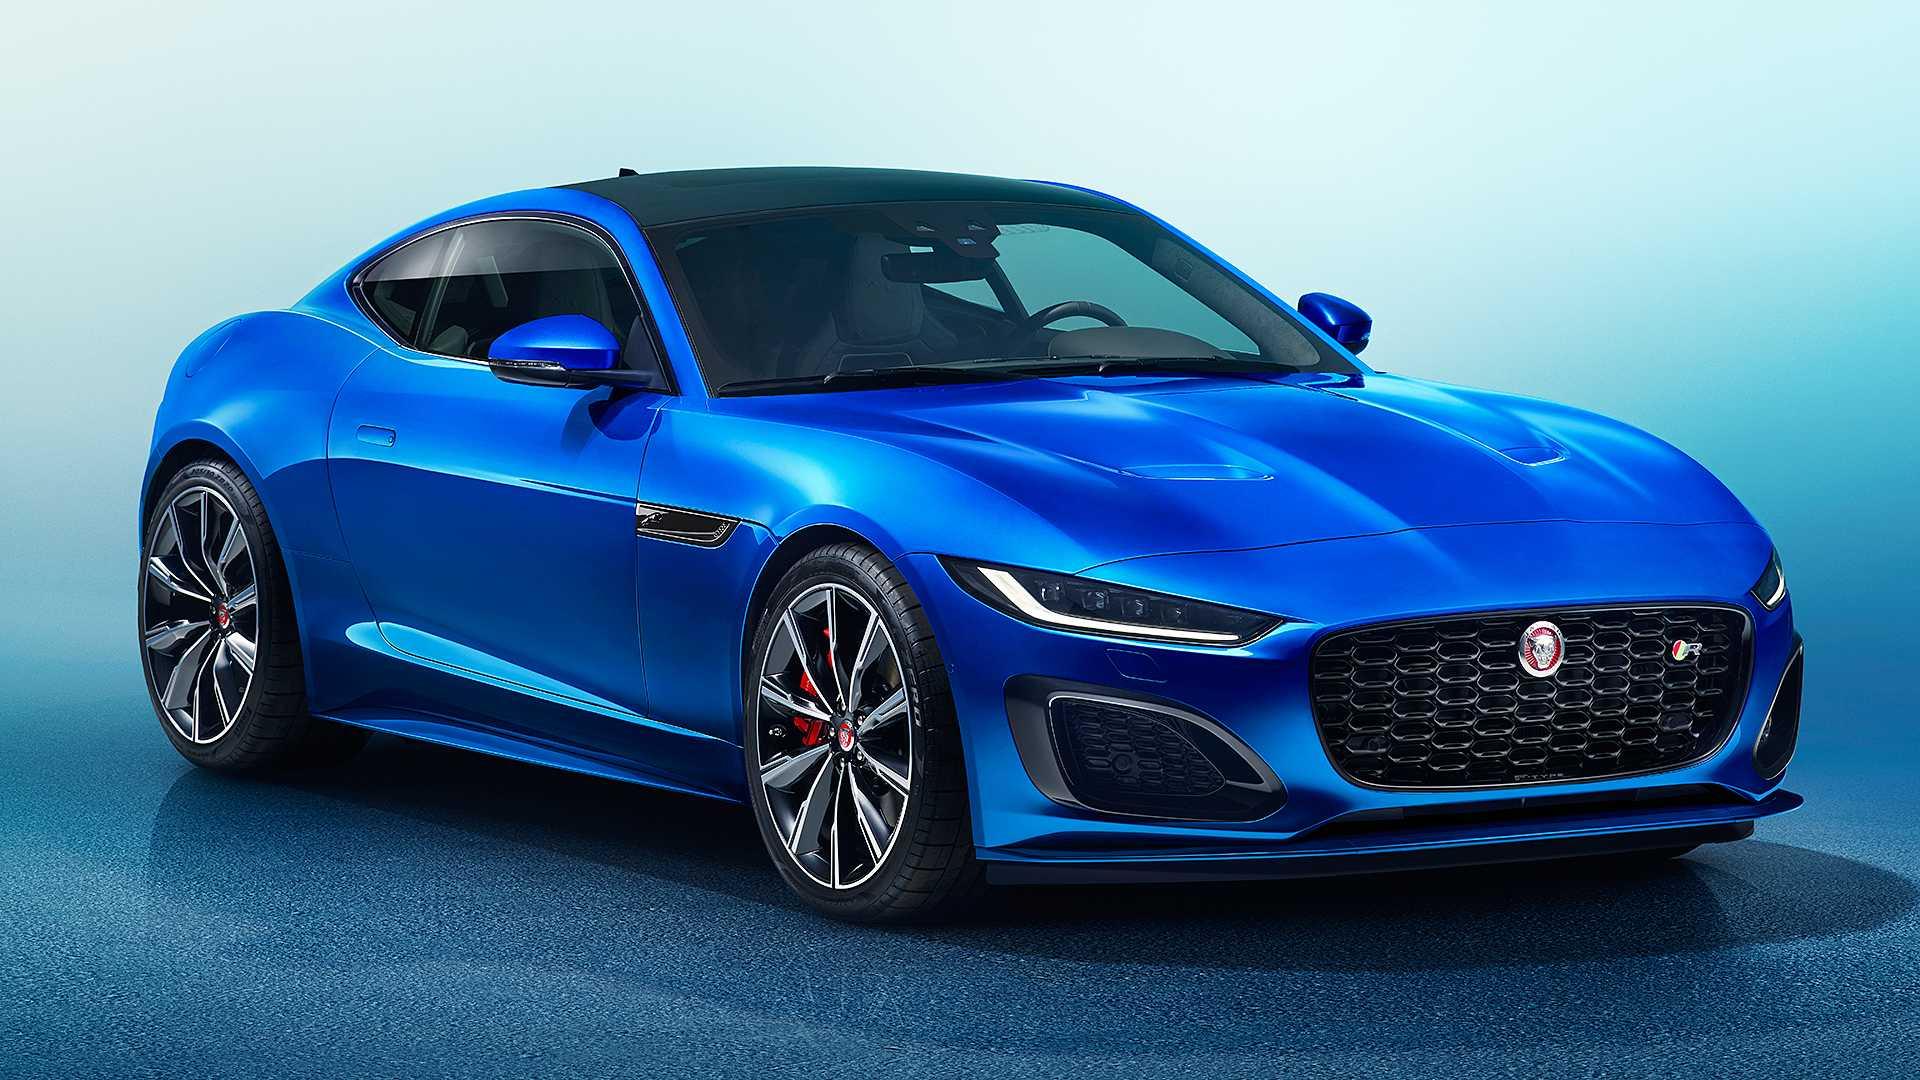 2021-jaguar-f-type-11